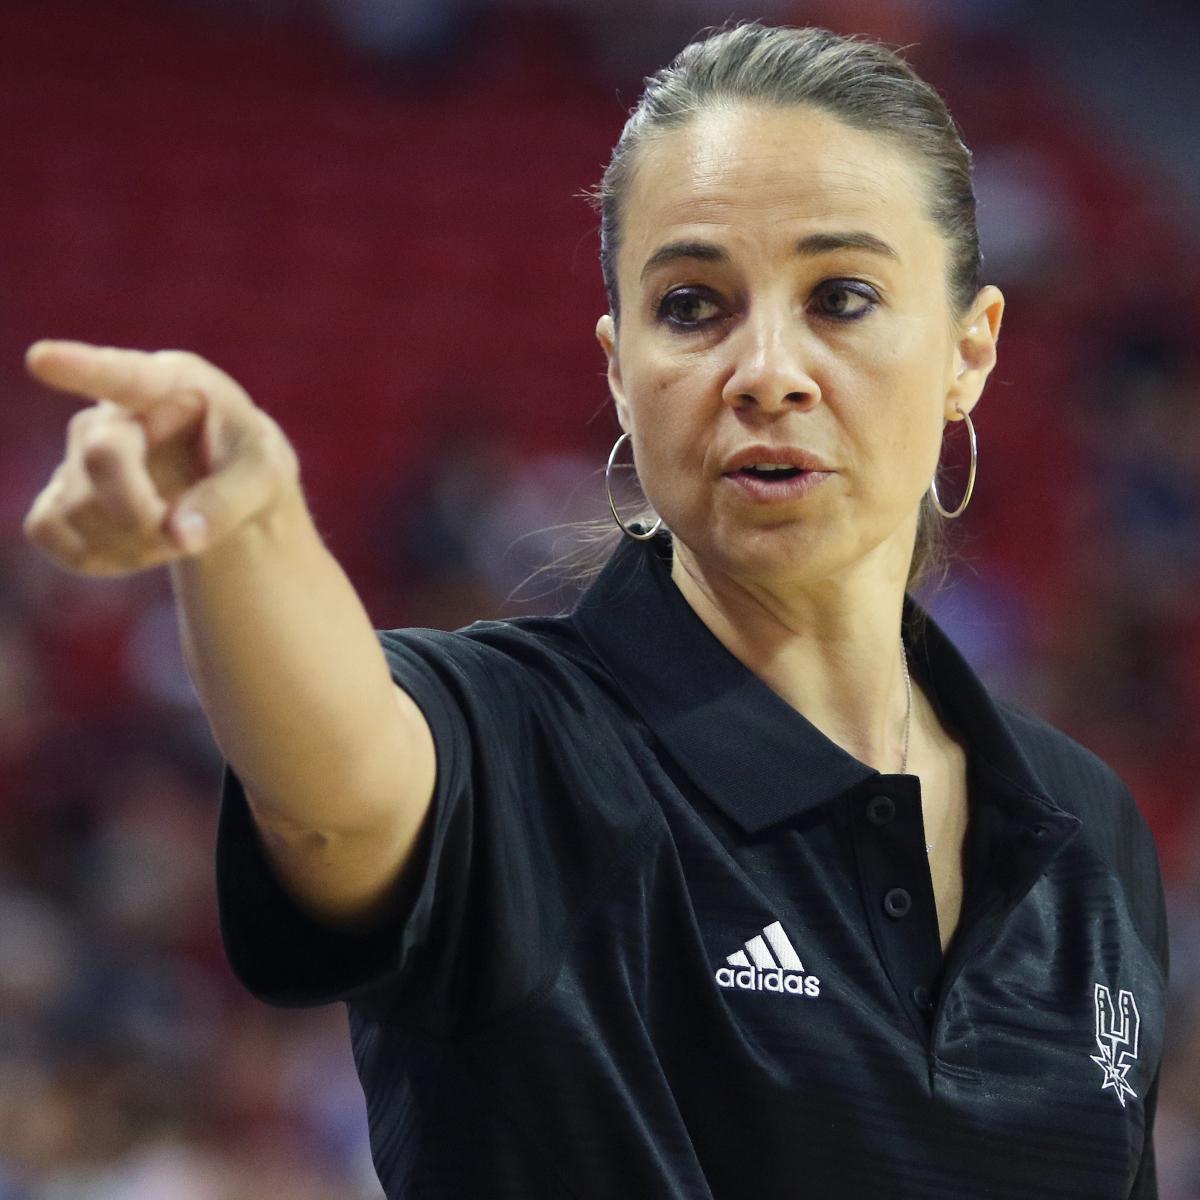 Bucks HC Rumors: Spurs' Becky Hammon, James Borrego to Interview for Open Job | Bleacher Report | Latest News, Videos and Highlights